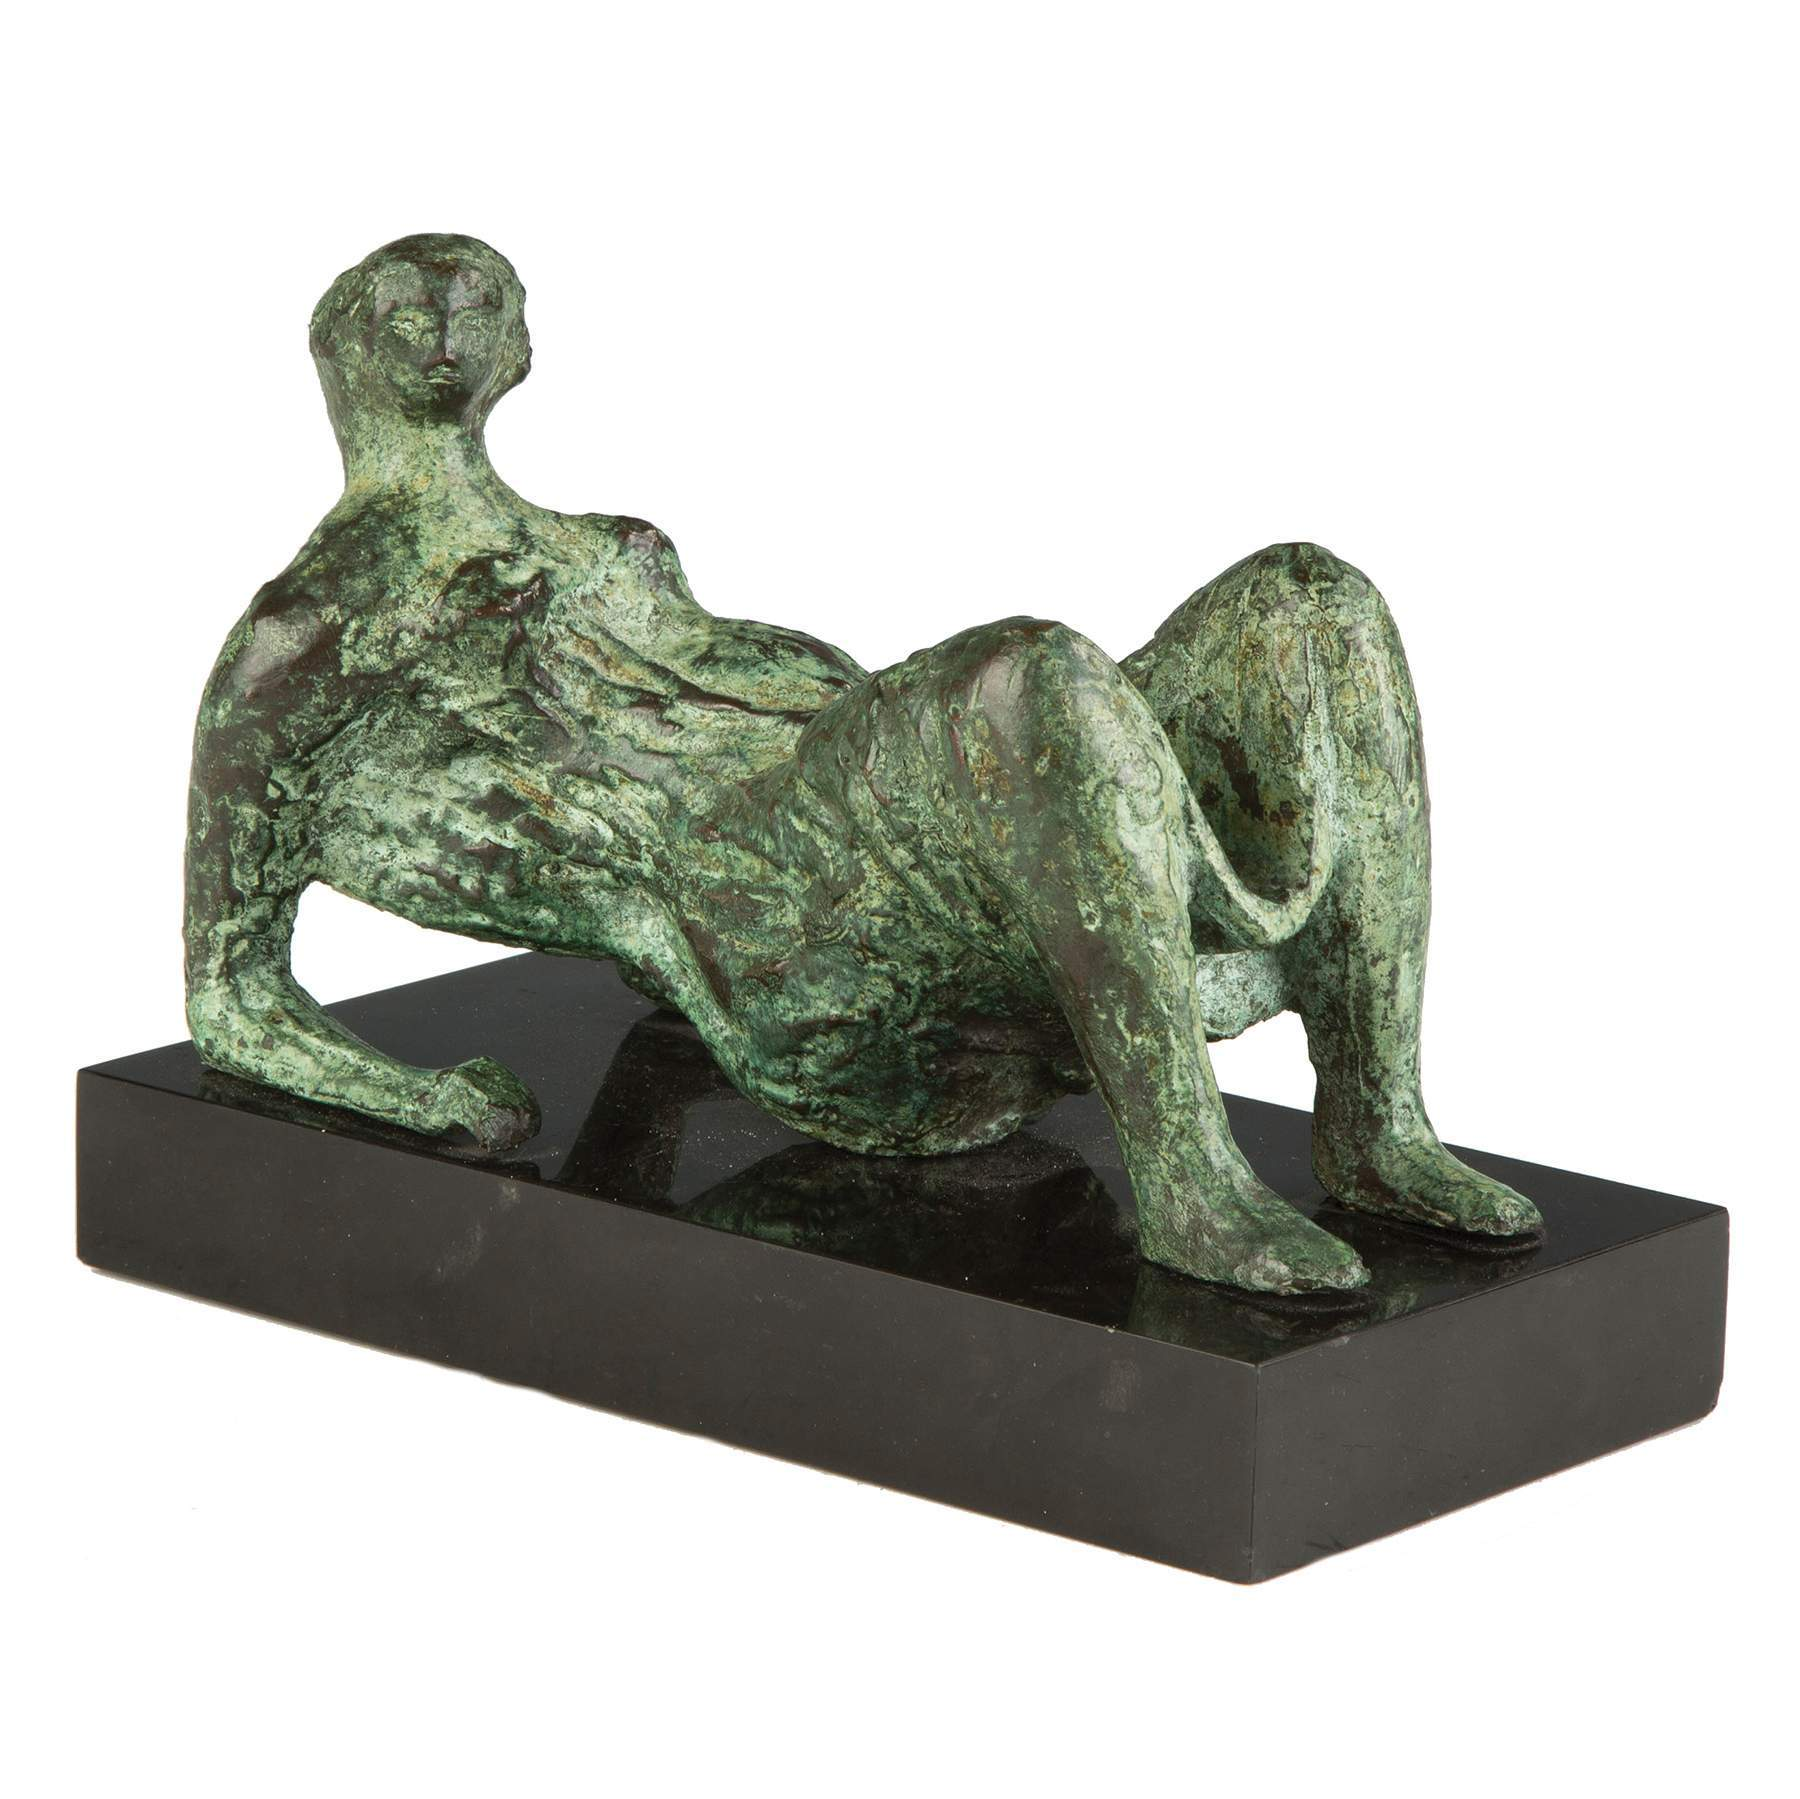 Henry Moore (British 1898-1986) Bronze Sculpture Maquette for Draped Reclining Figure  sc 1 st  Cottone Auctions & Henry Moore (British 1898-1986) Bronze Sculpture Maquette for ... islam-shia.org